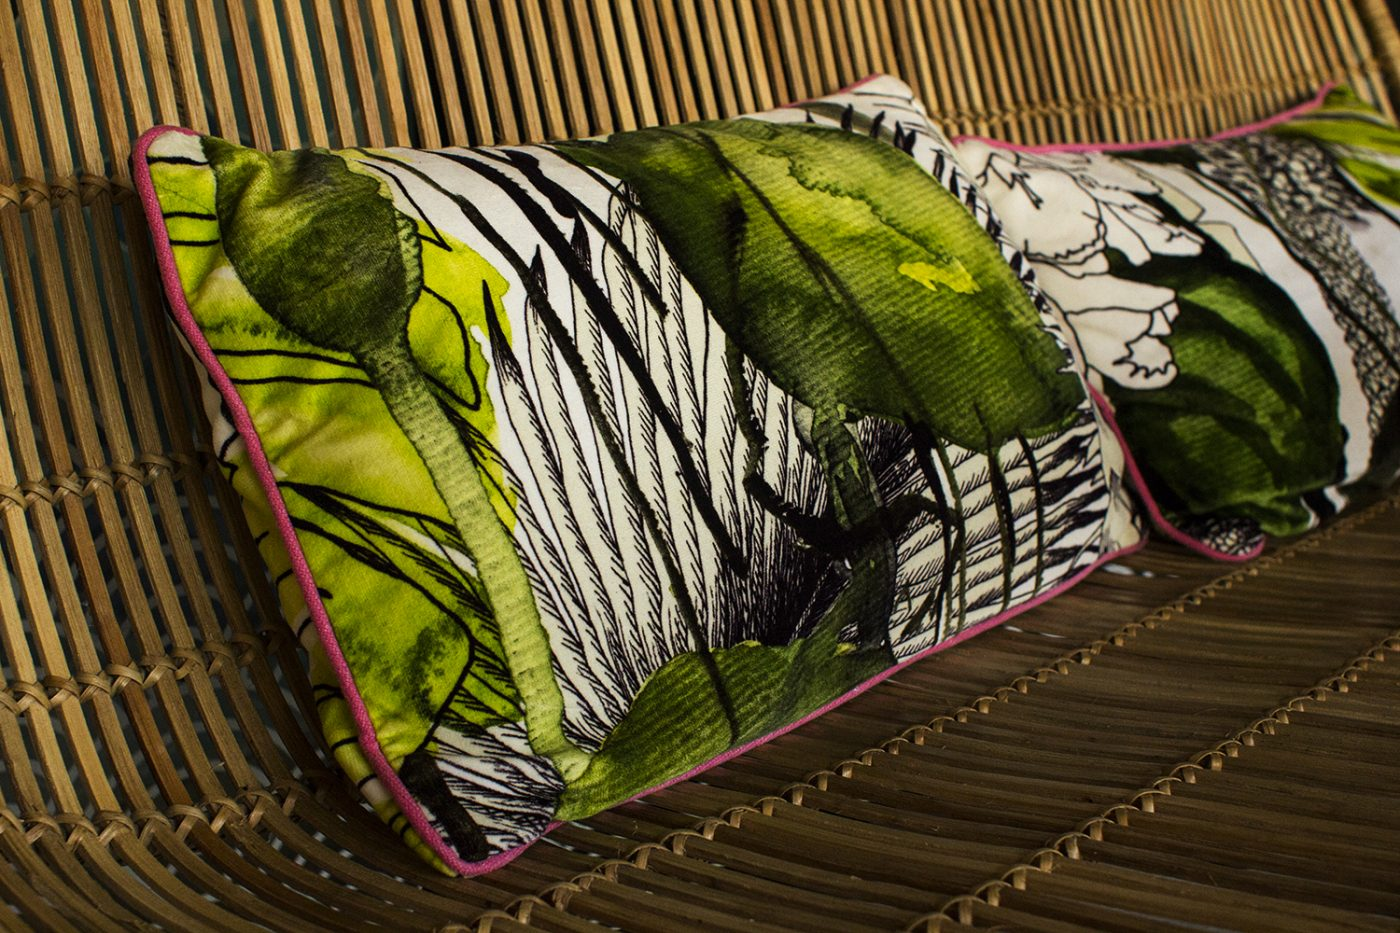 island-poke-cushions-interior-design-details-textiles-hawaiian